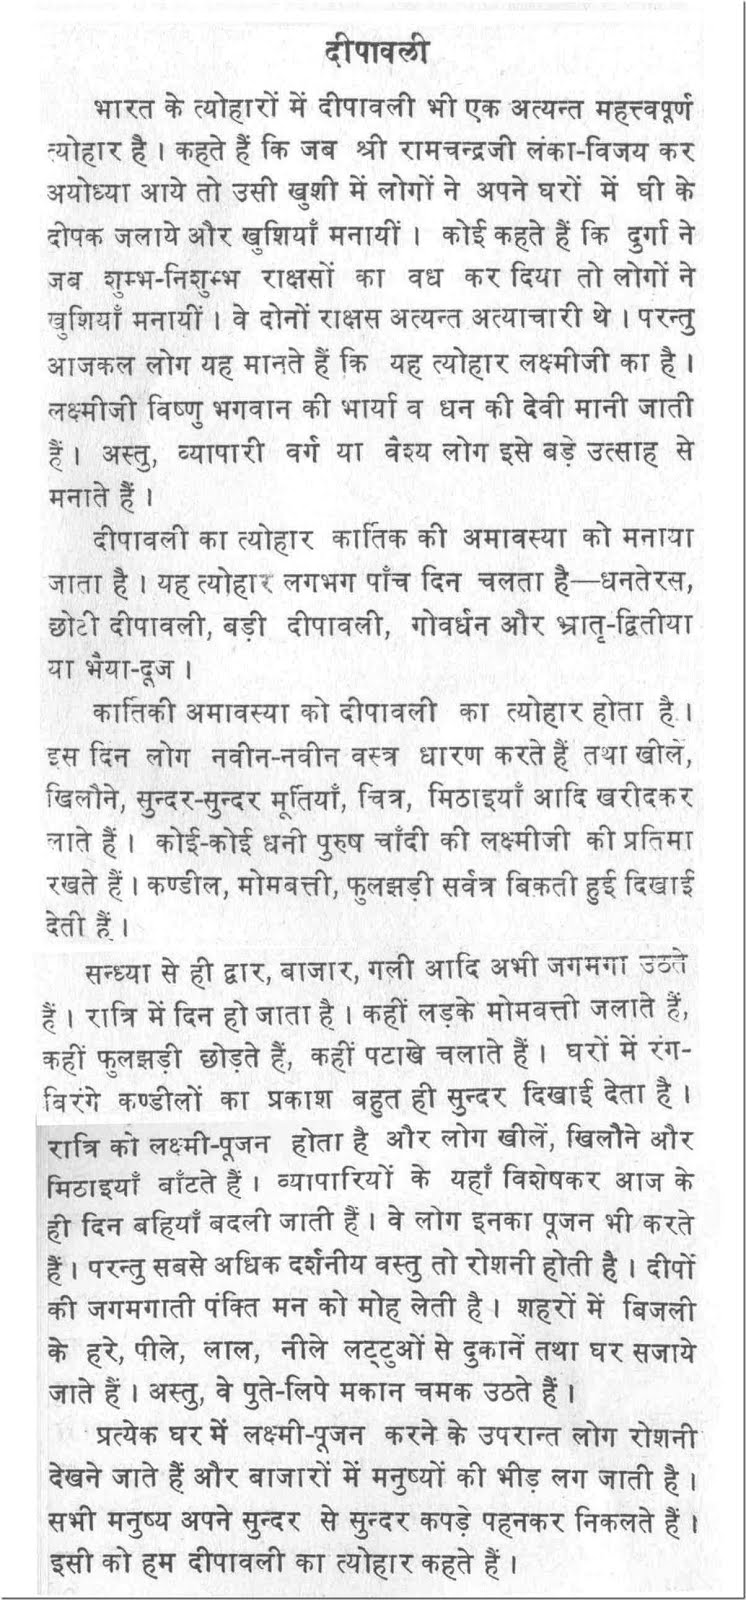 017 Essay Example Diwali20esay20in20hindi Hard Wonderful Work Pdf Pays Off In Hindi Writing Full